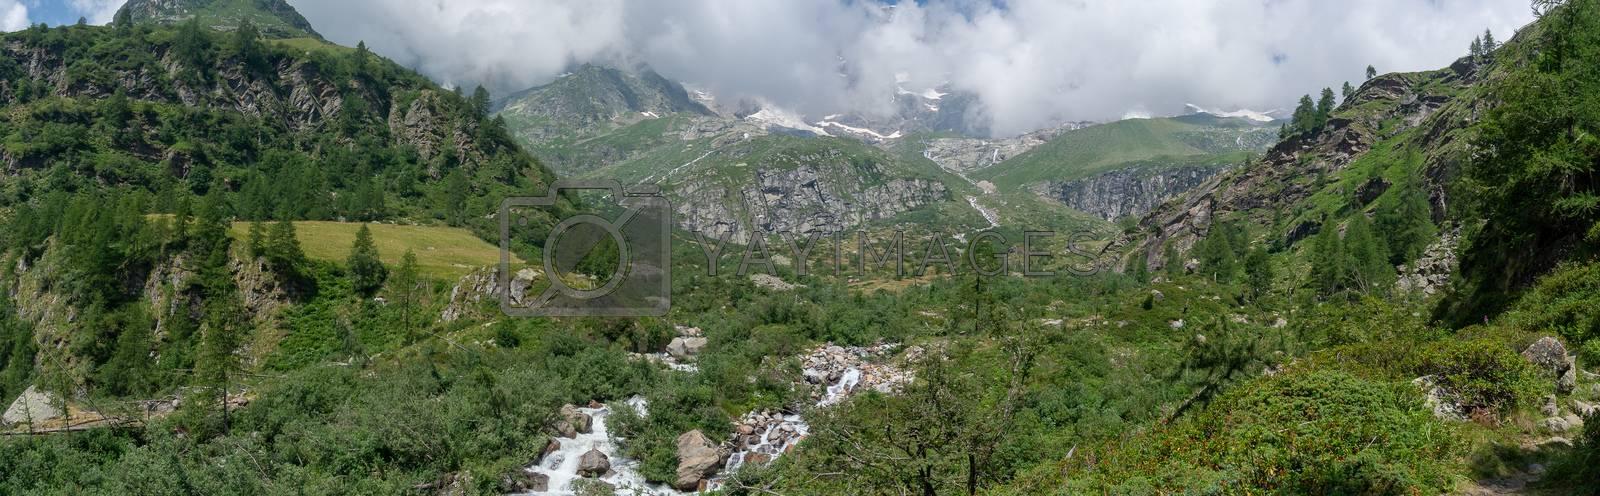 Hiking for health in Italian alps landscape